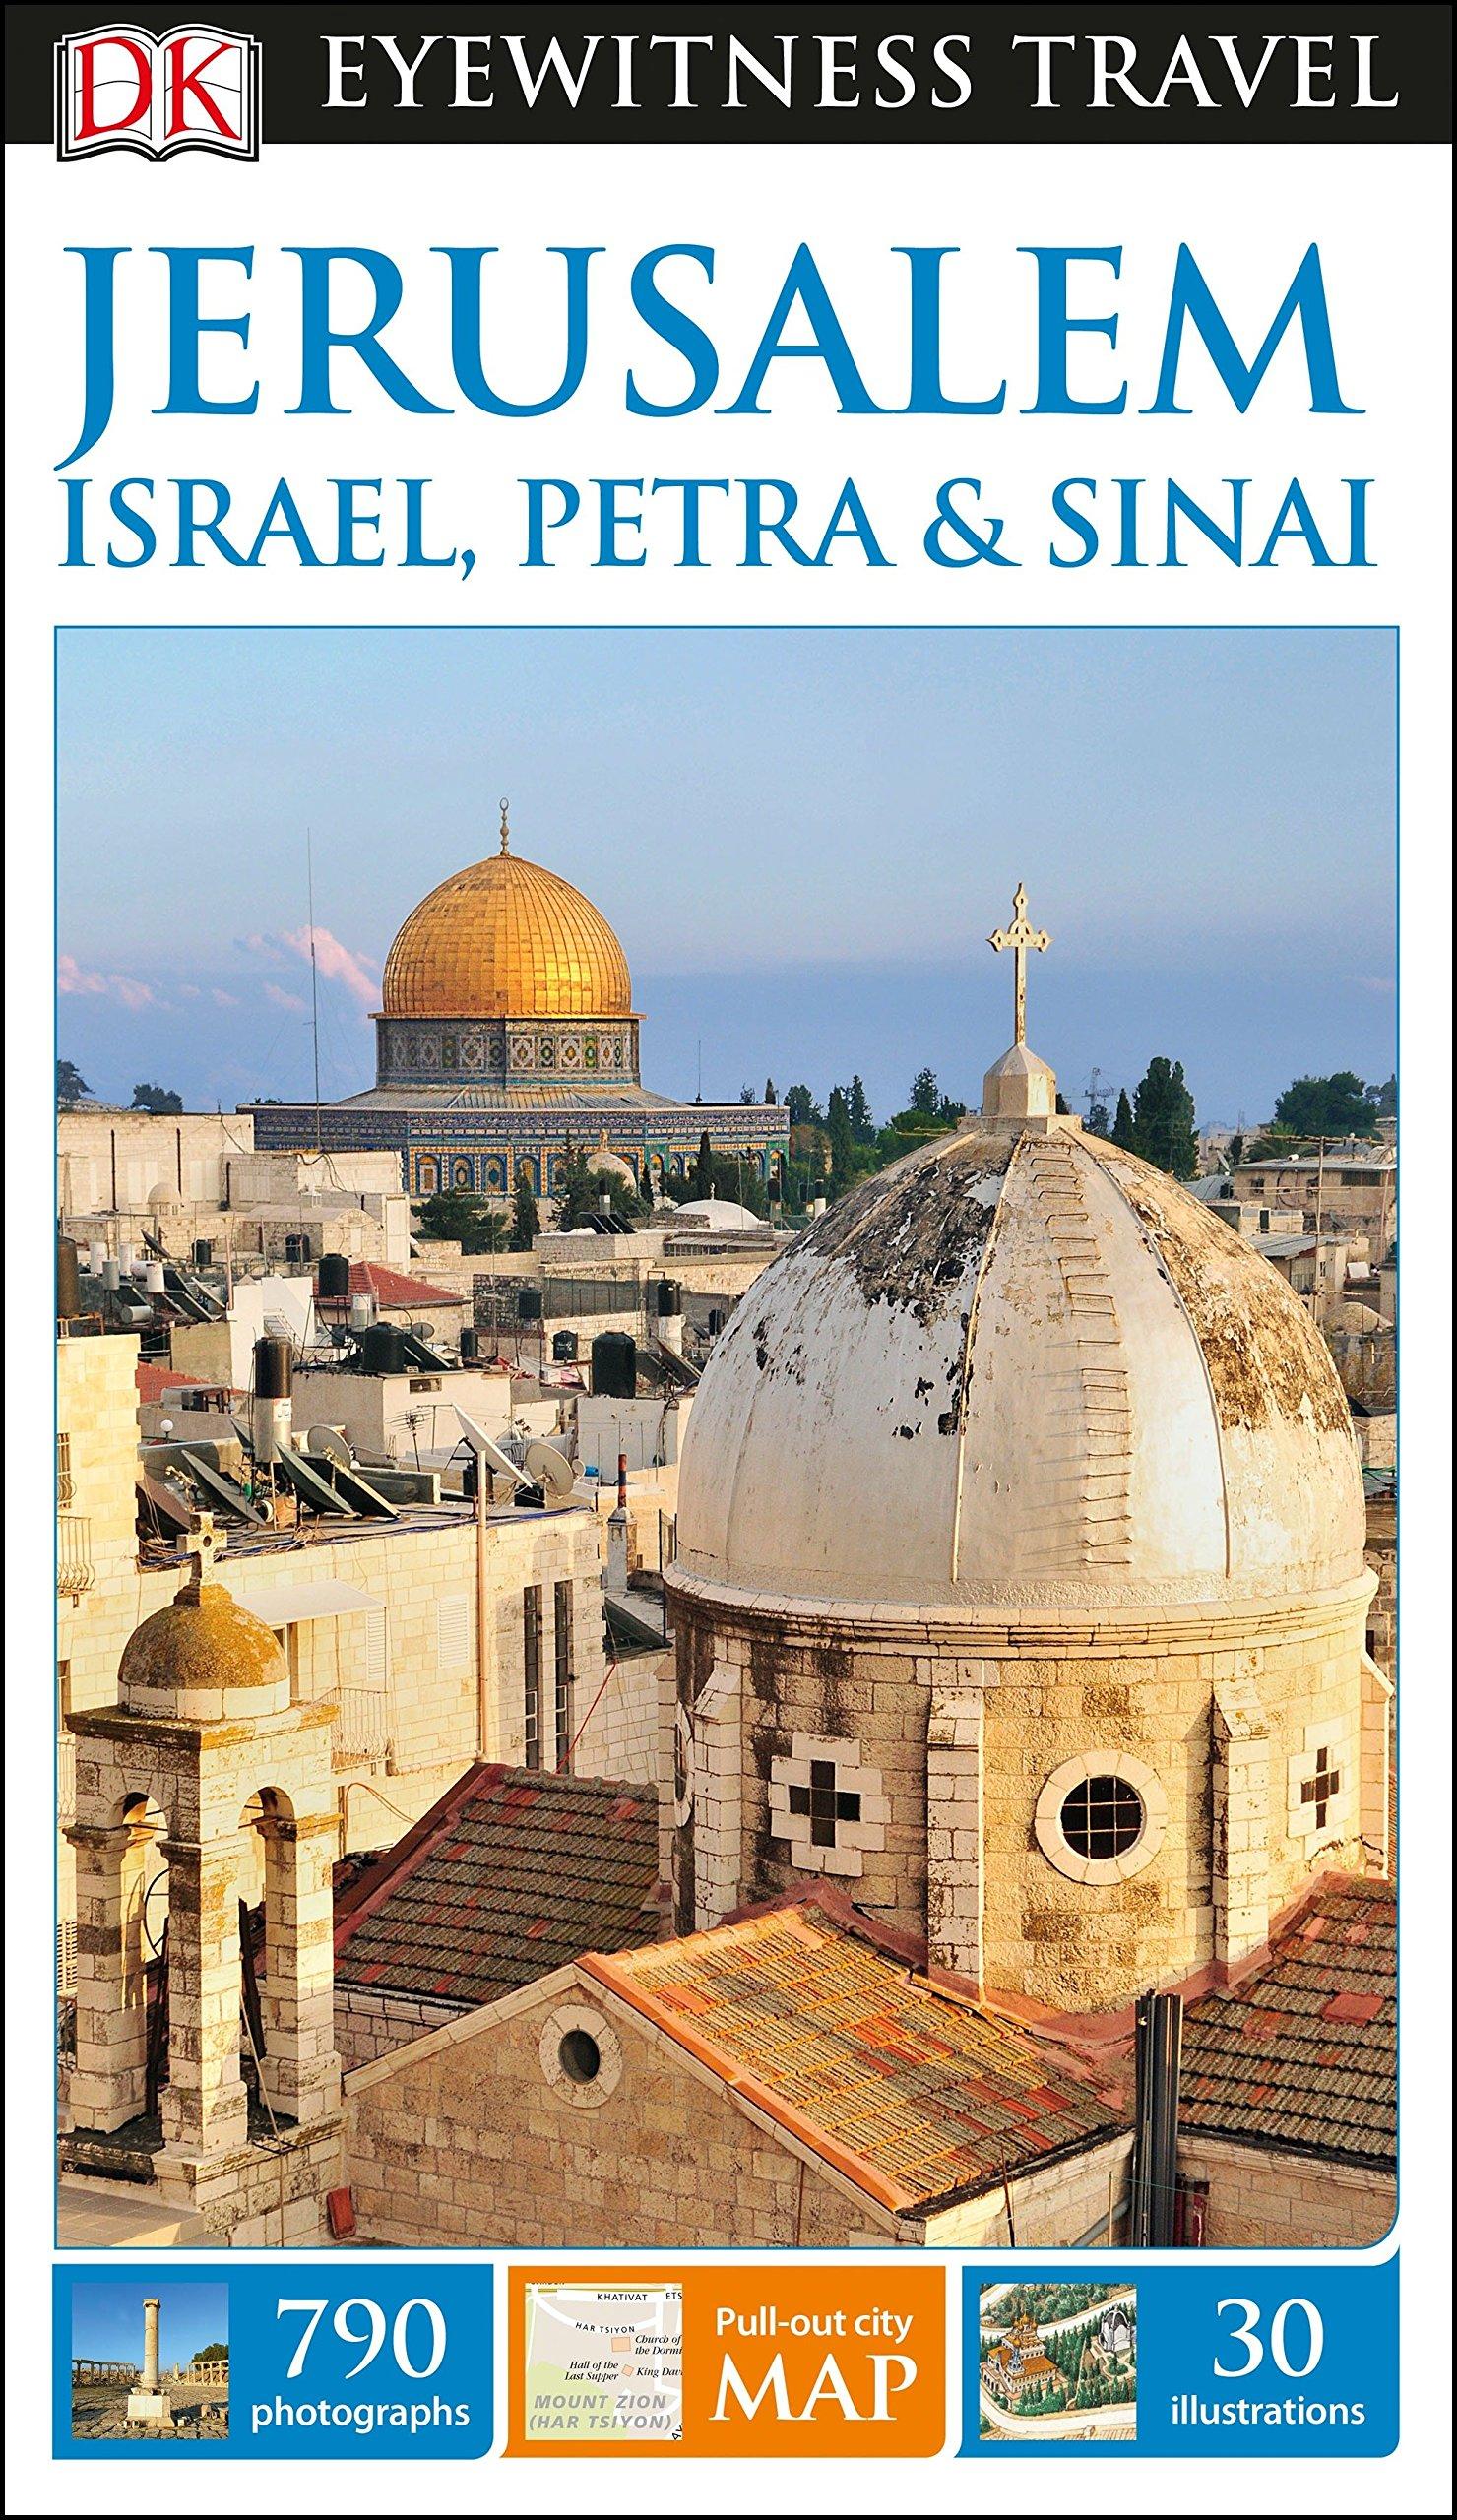 DK Eyewitness Travel Guide Jerusalem, Israel, Petra and Sinai pdf